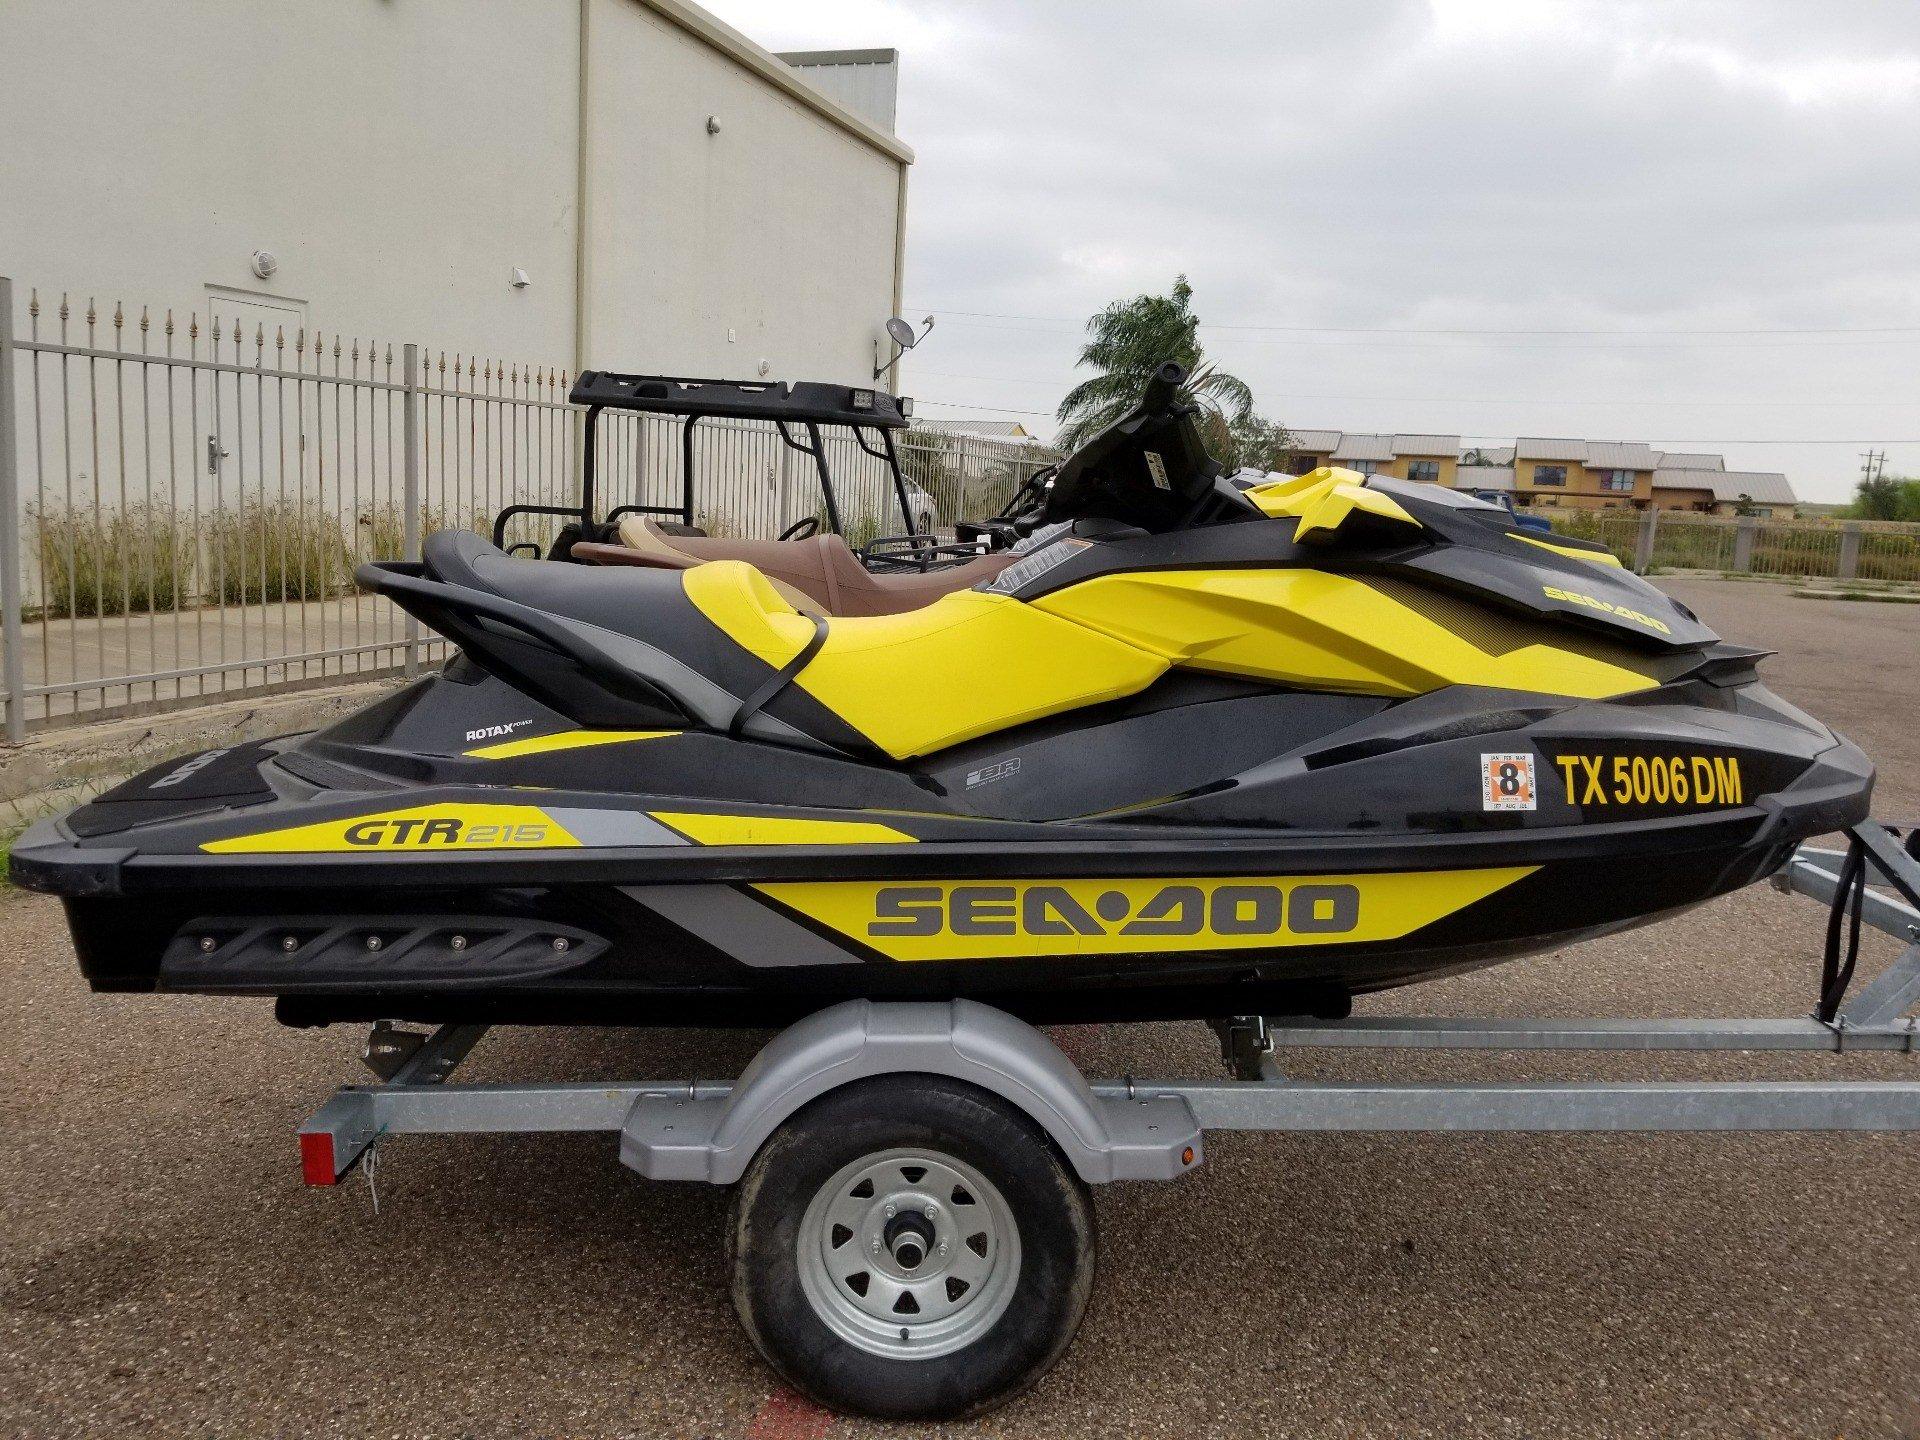 2016 Sea Doo Gtr 215 In Laredo Texas